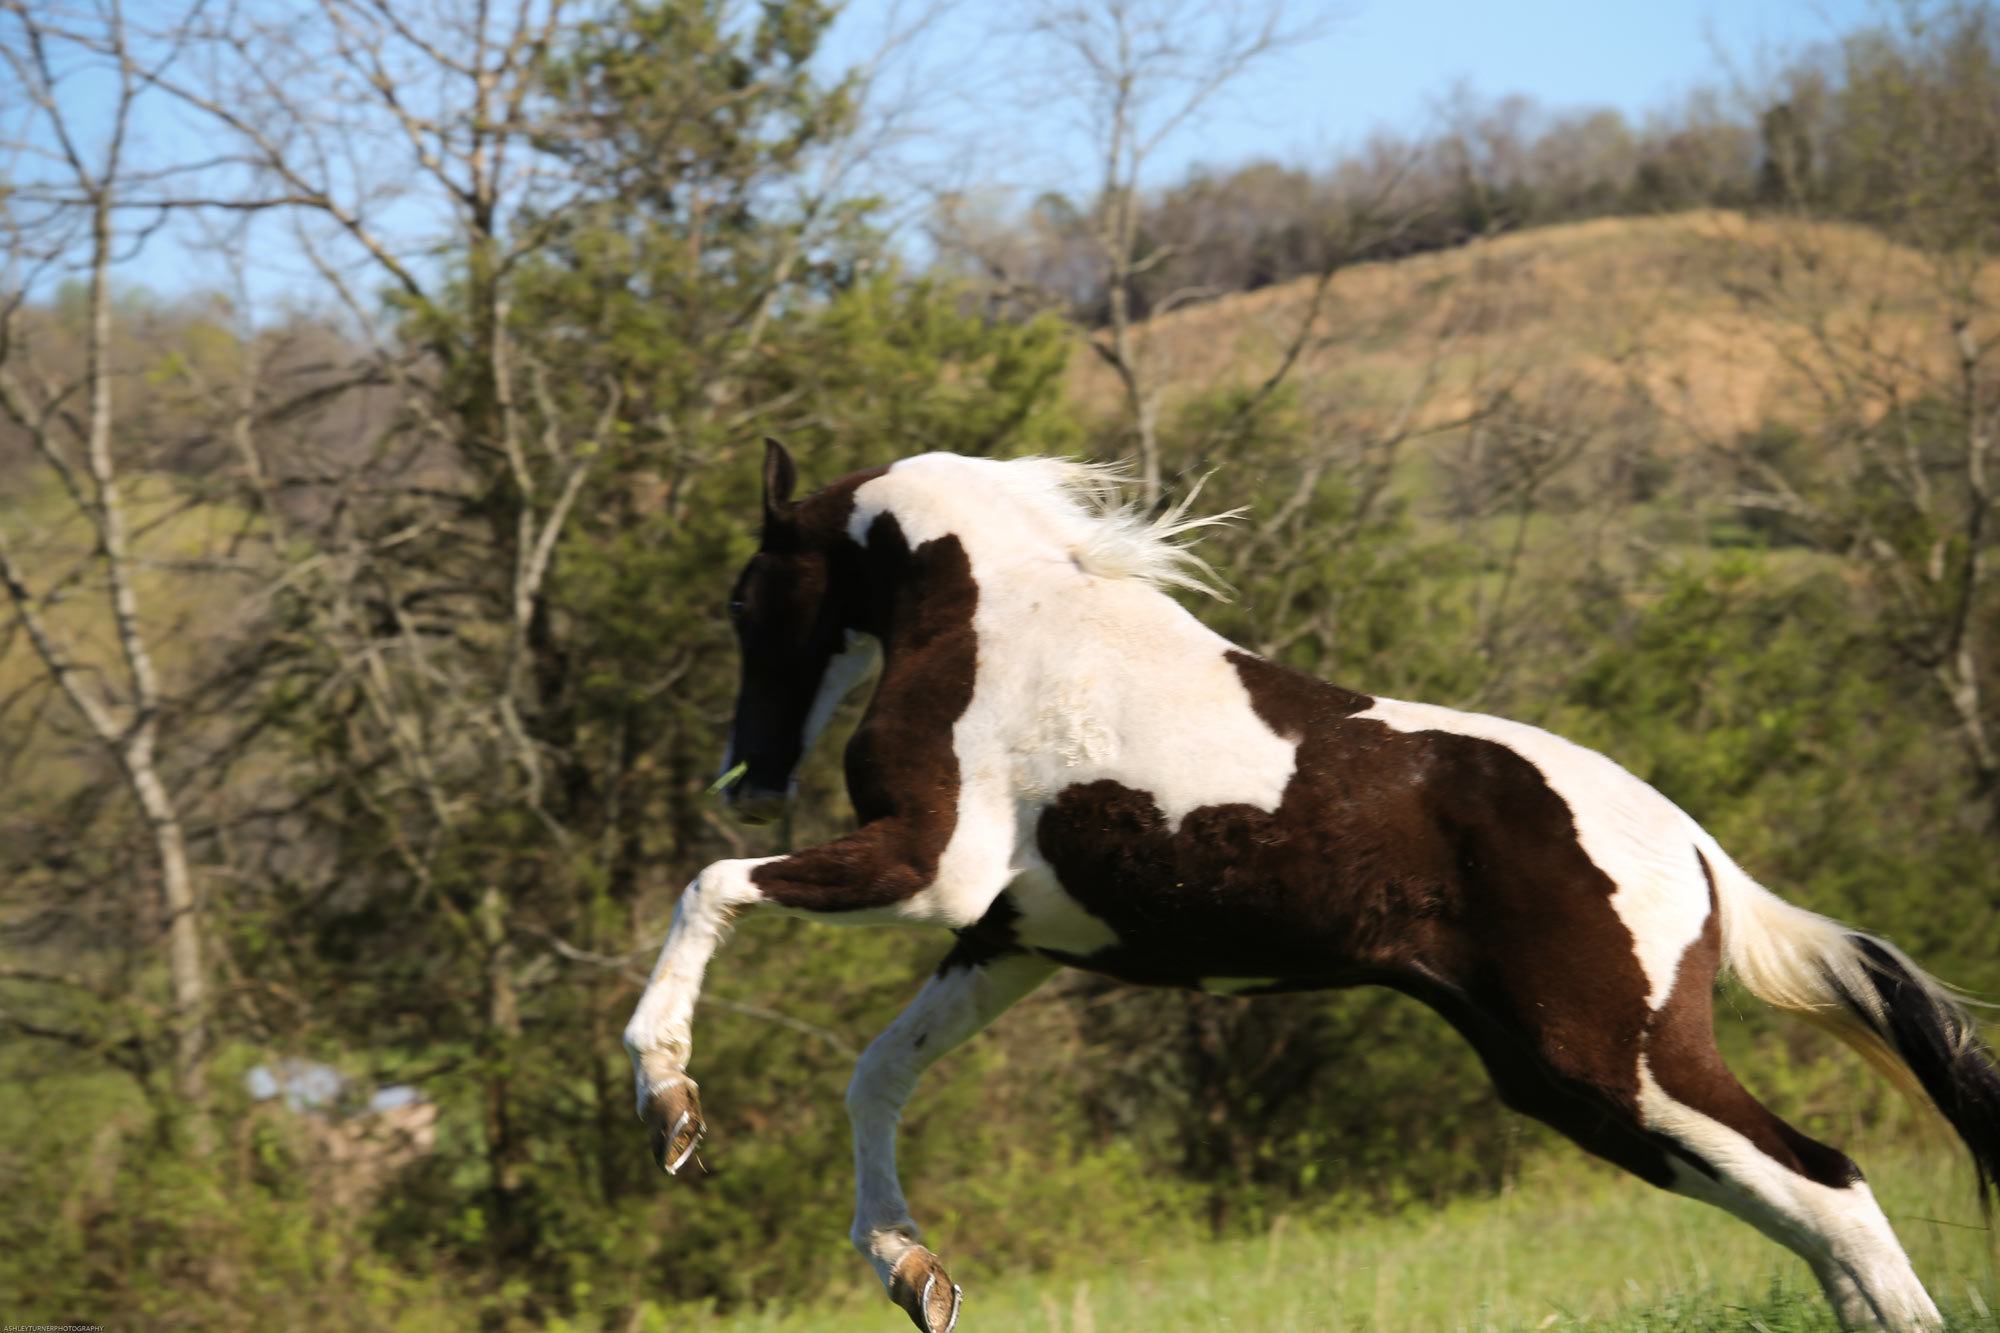 Equine Retirement Home